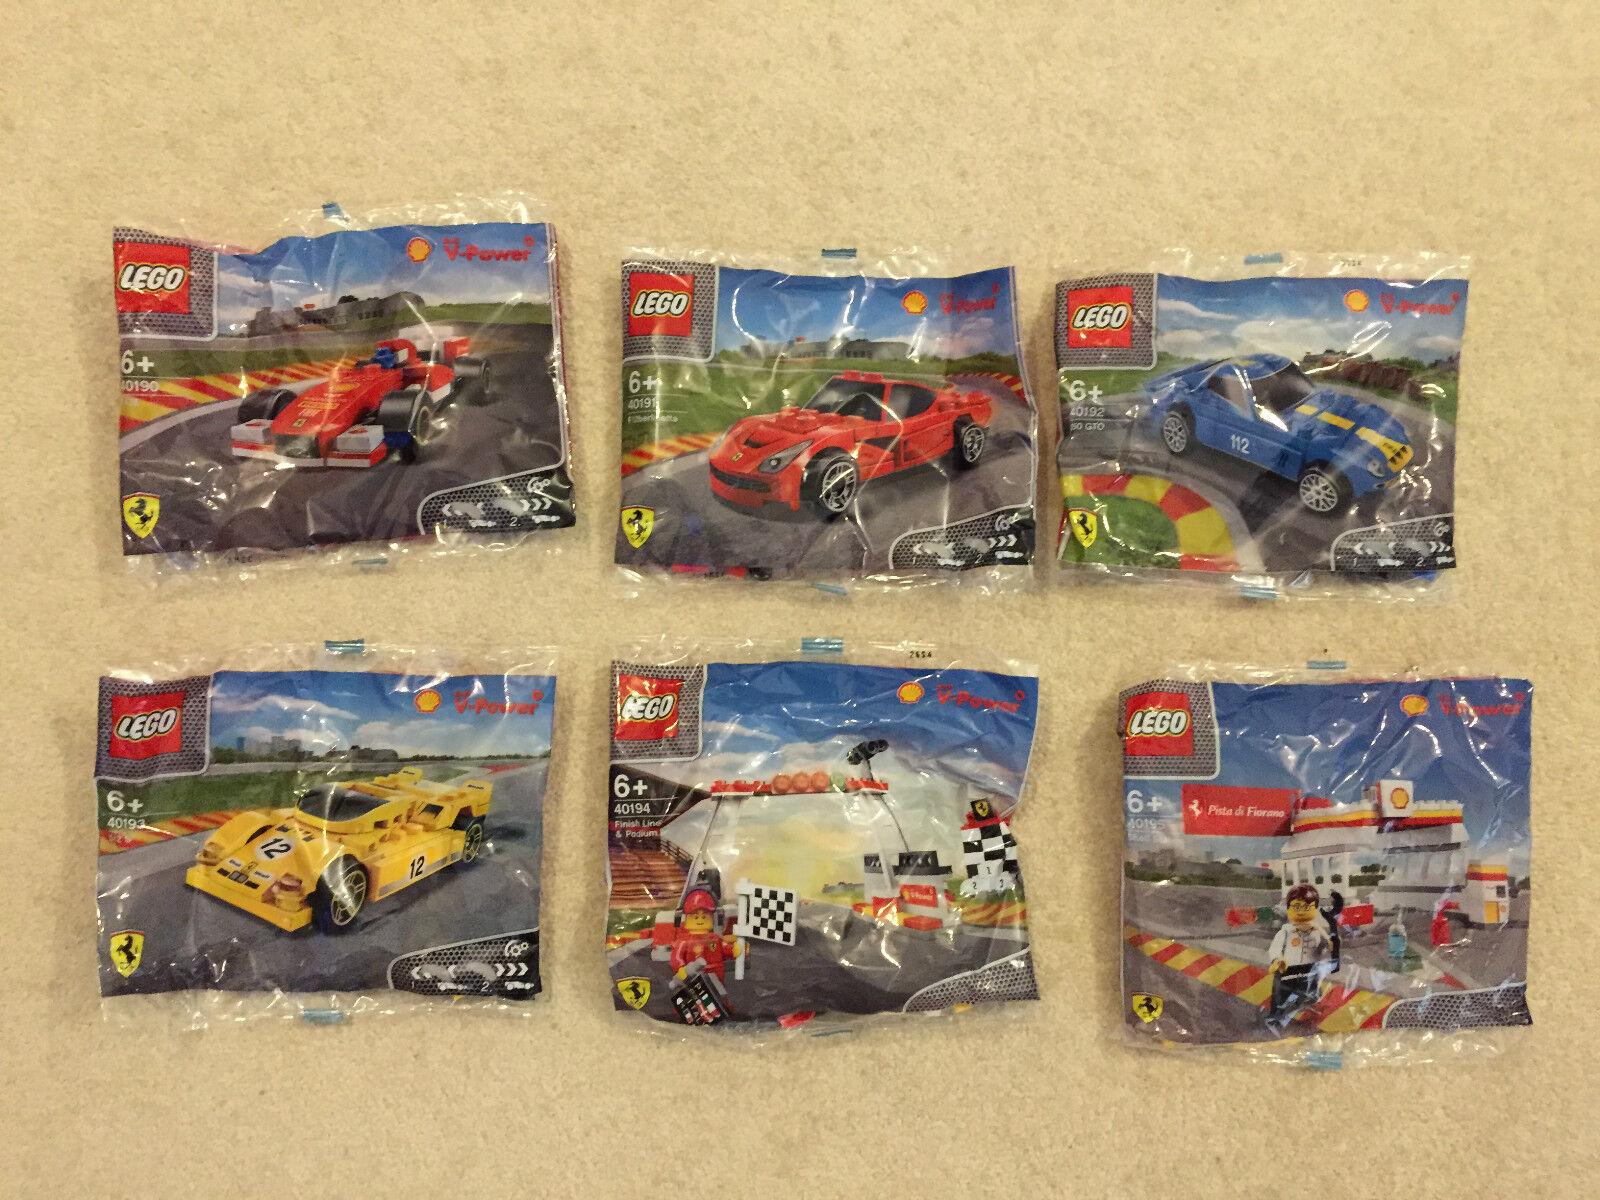 Shell Lego Ferrari Toy Model Cars Set Of 6 NEW 40190-40195 LOOK